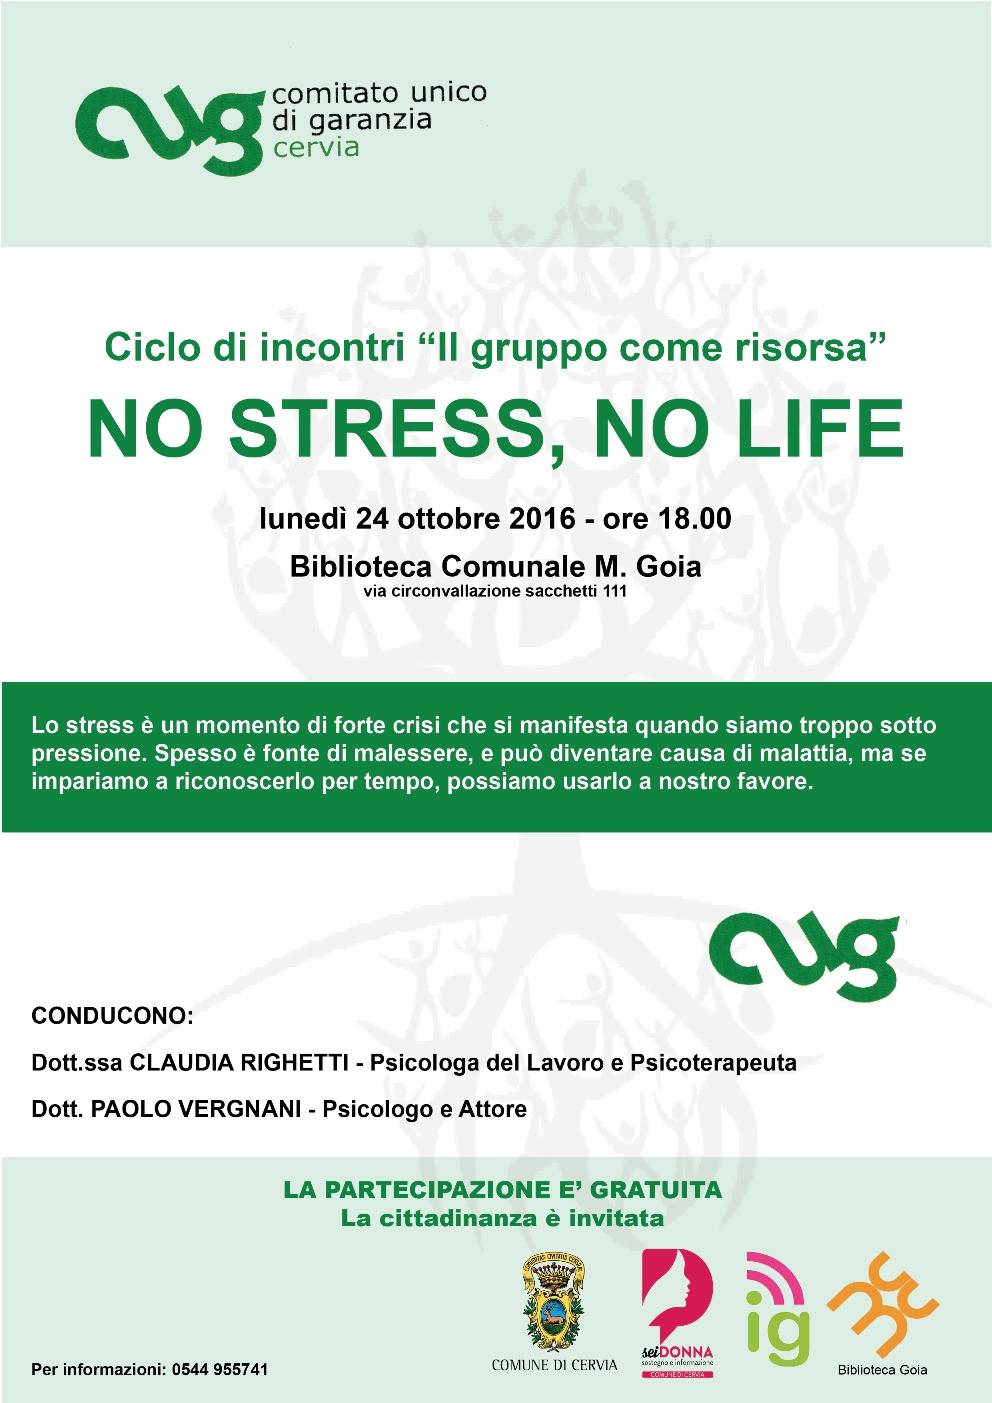 No stress no life